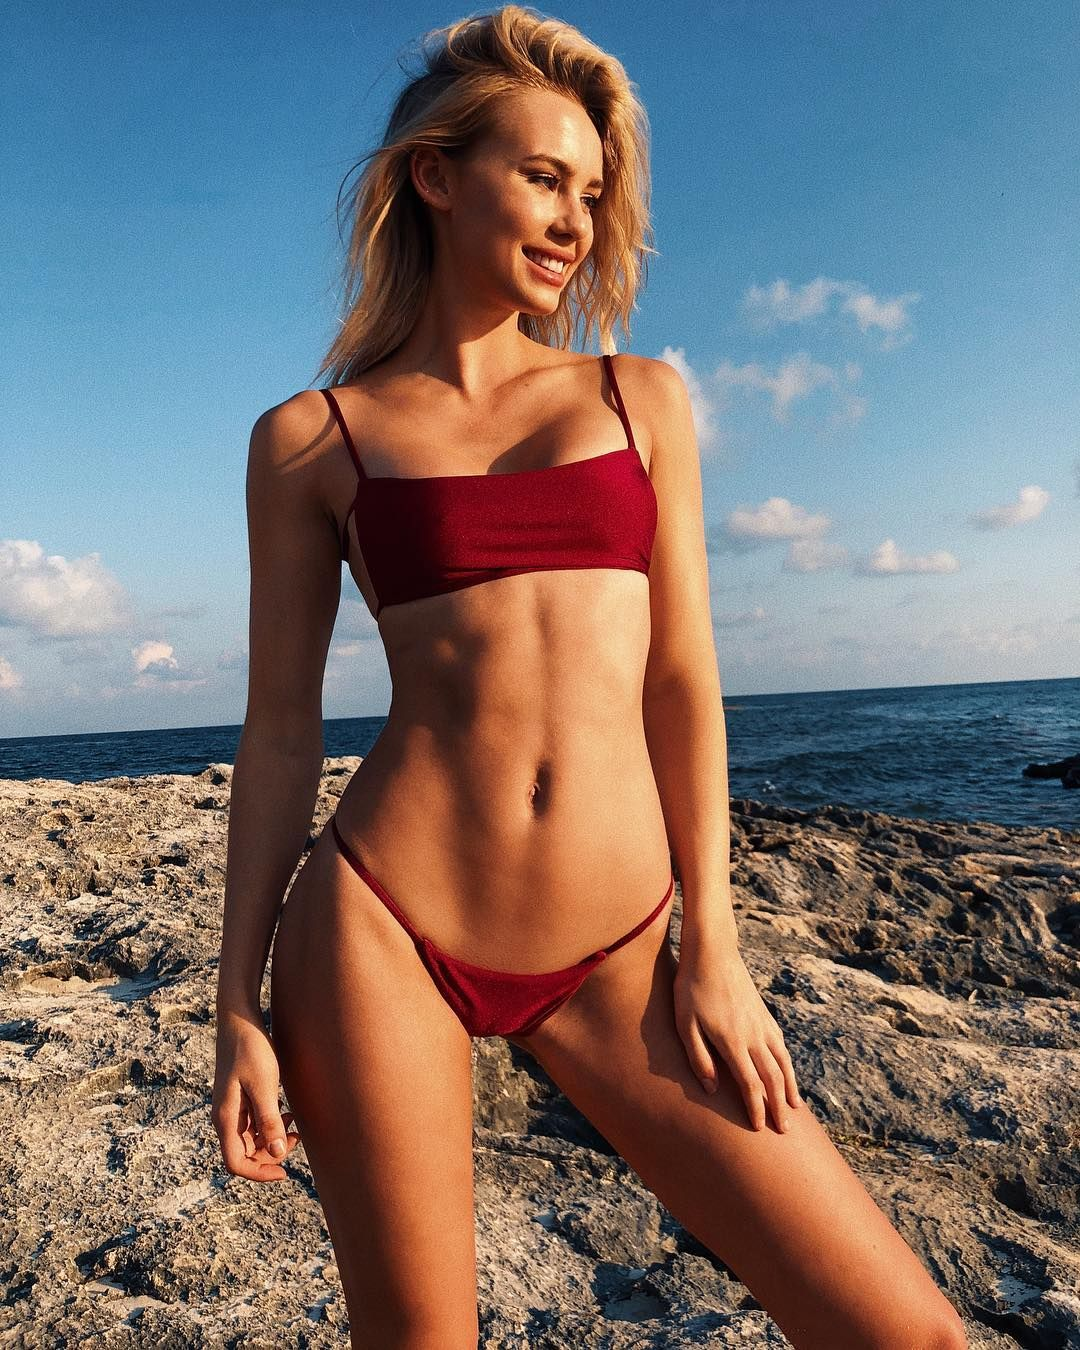 beach Blonde micro bikini